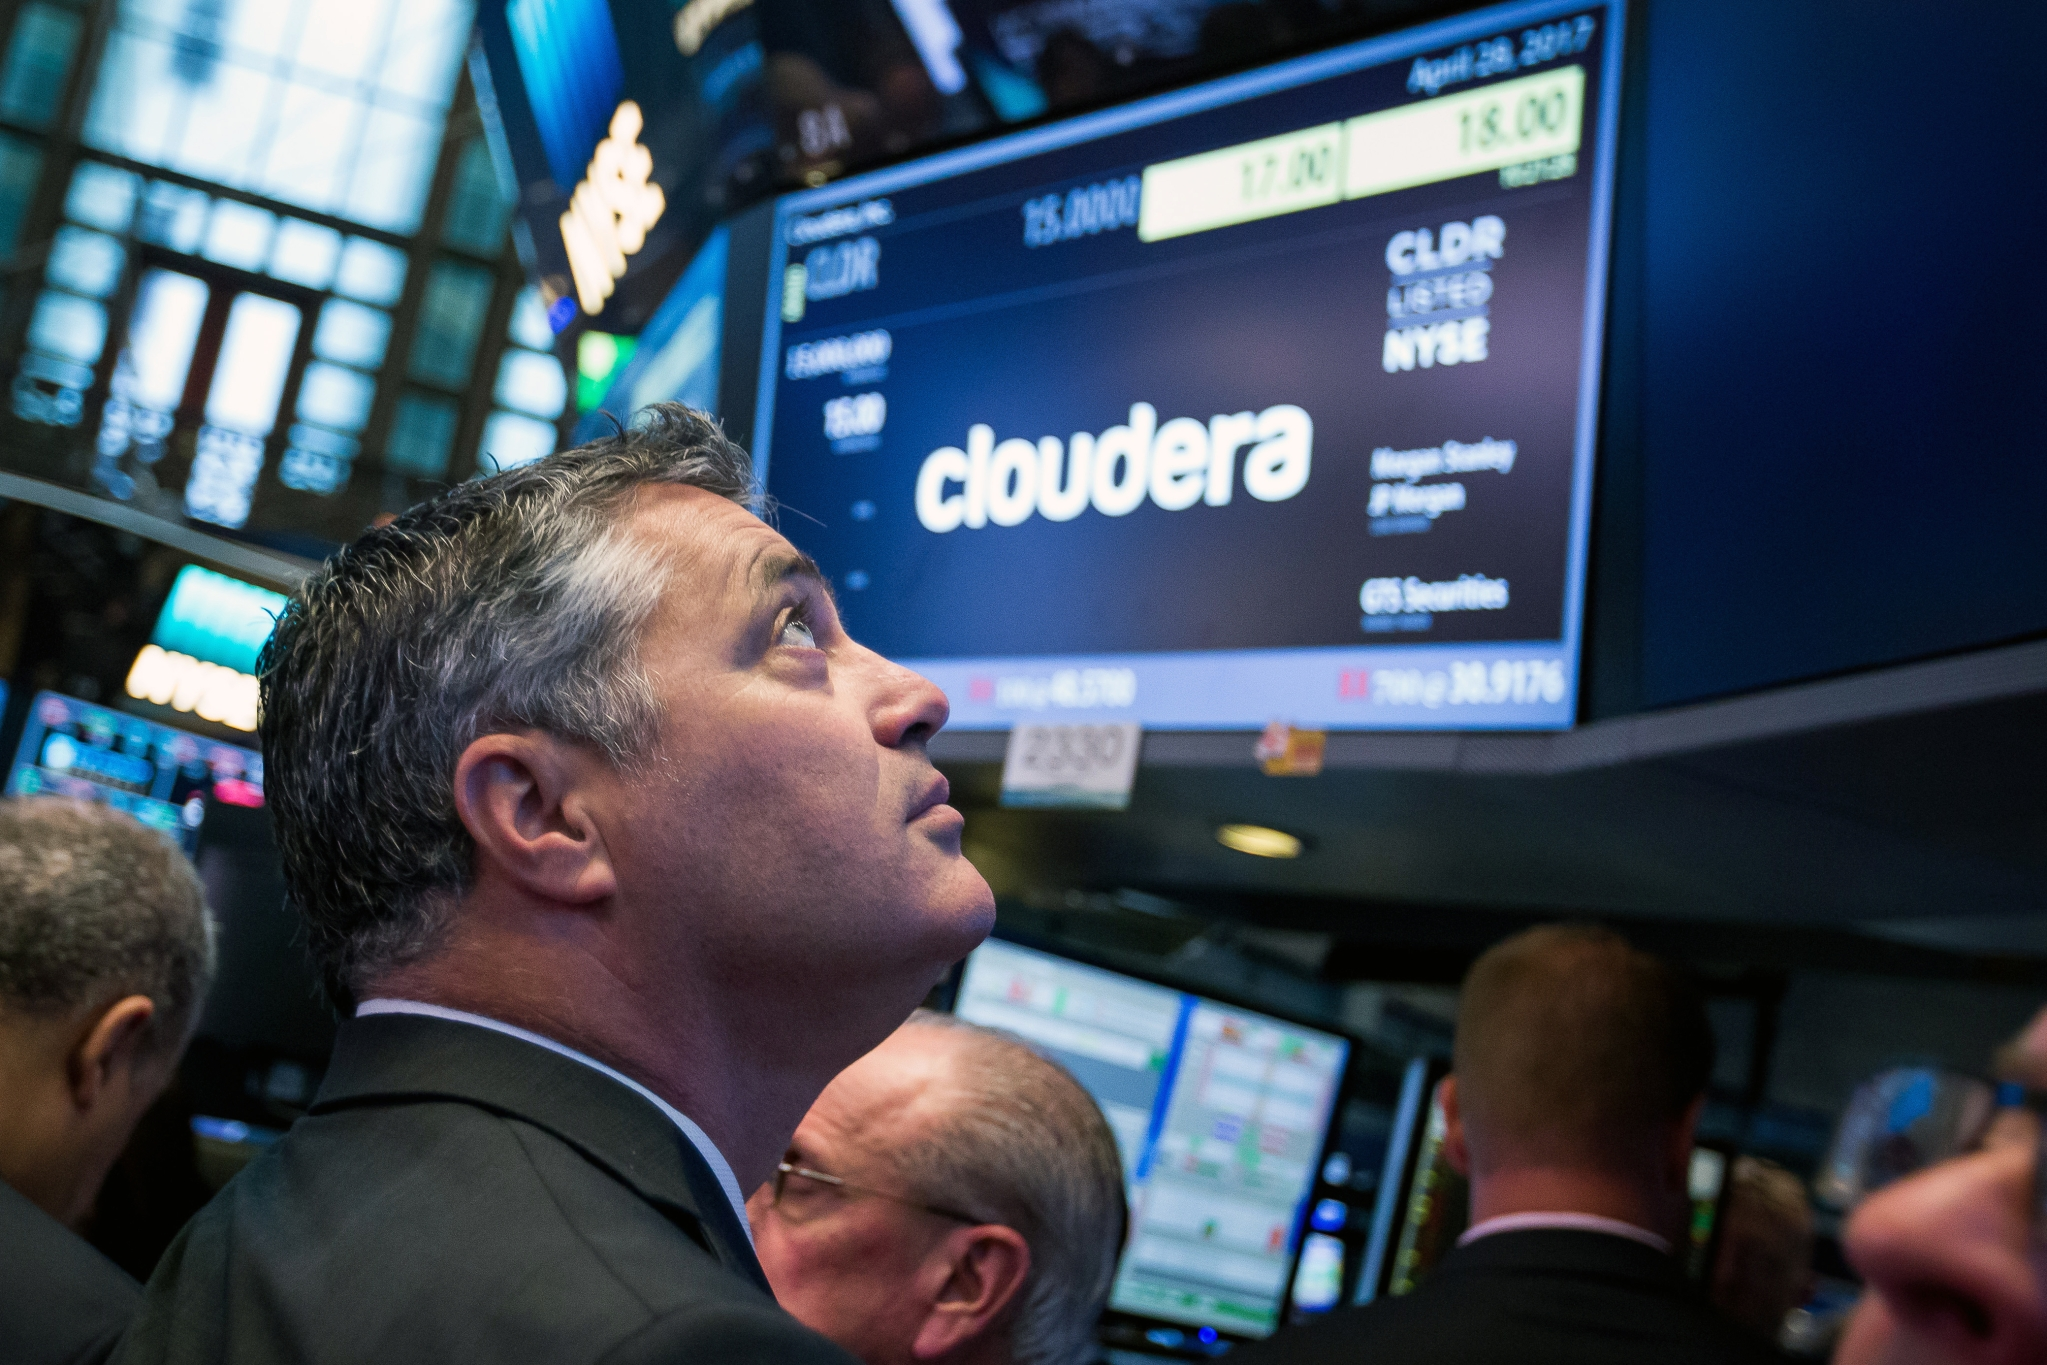 Cloudera stock options